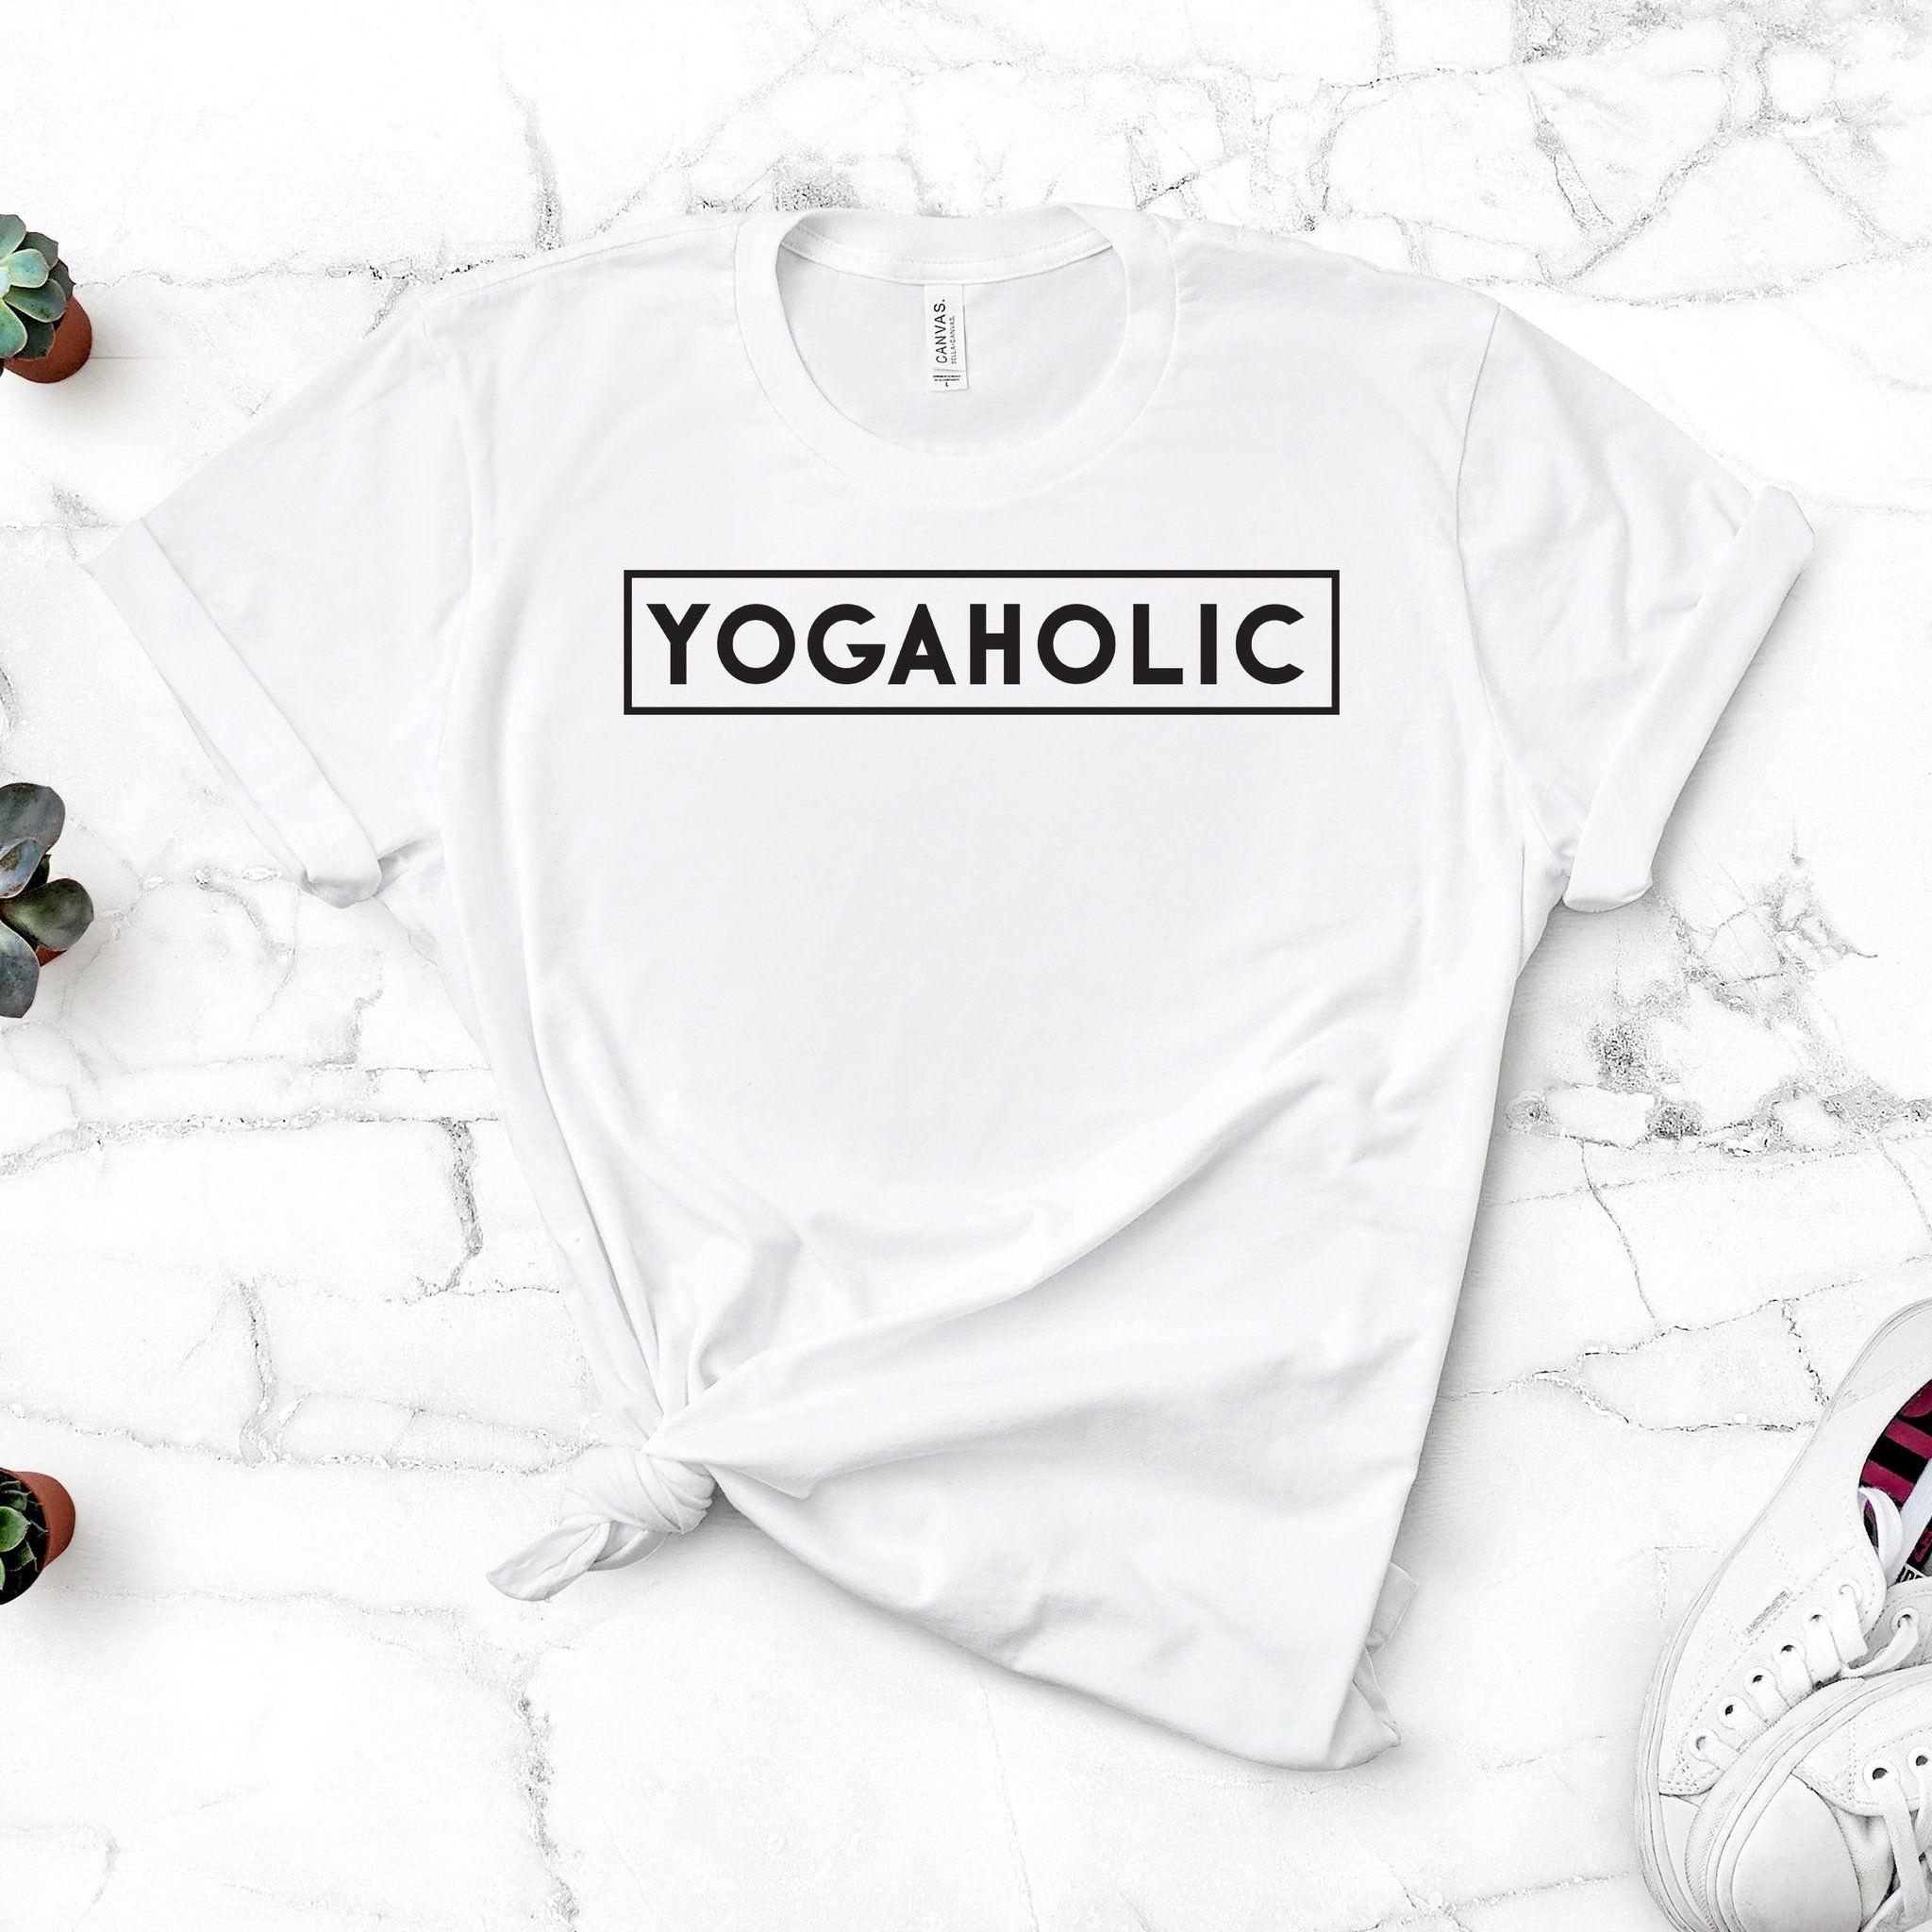 Yogaholic T Shirt Yoga Style Outfits Funny Yoga Shirt Yoga Clothes